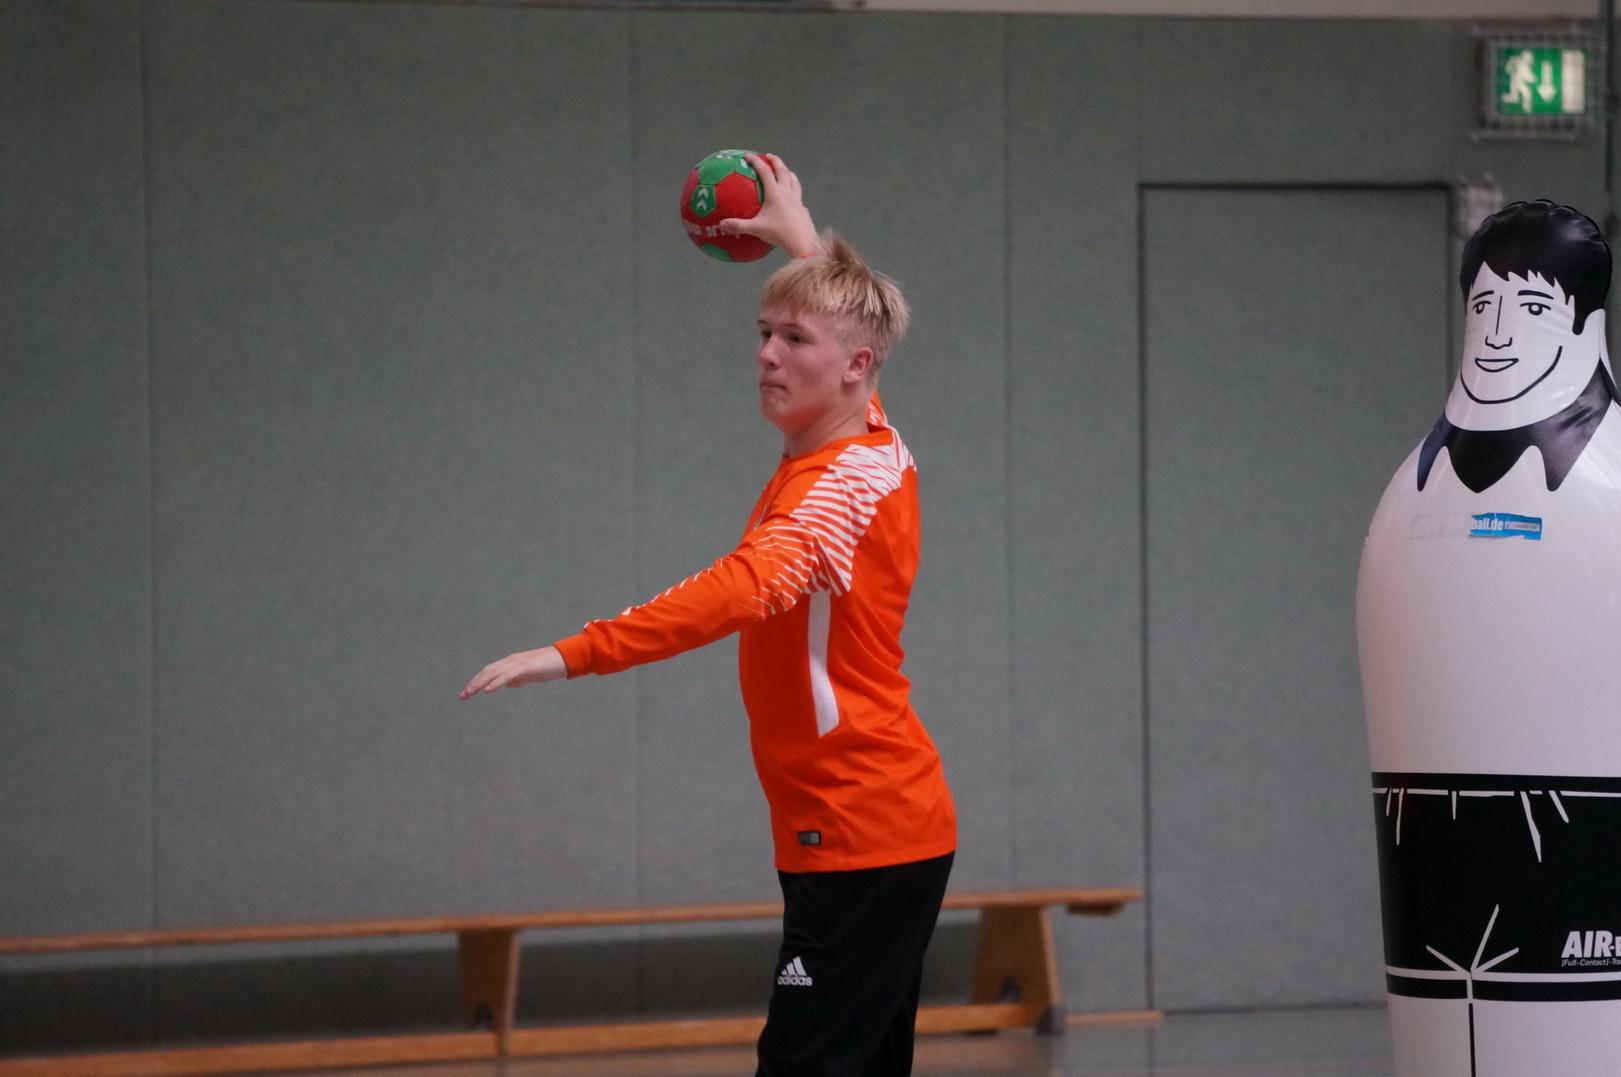 201808_Handballcamp_SDH_MG_204w